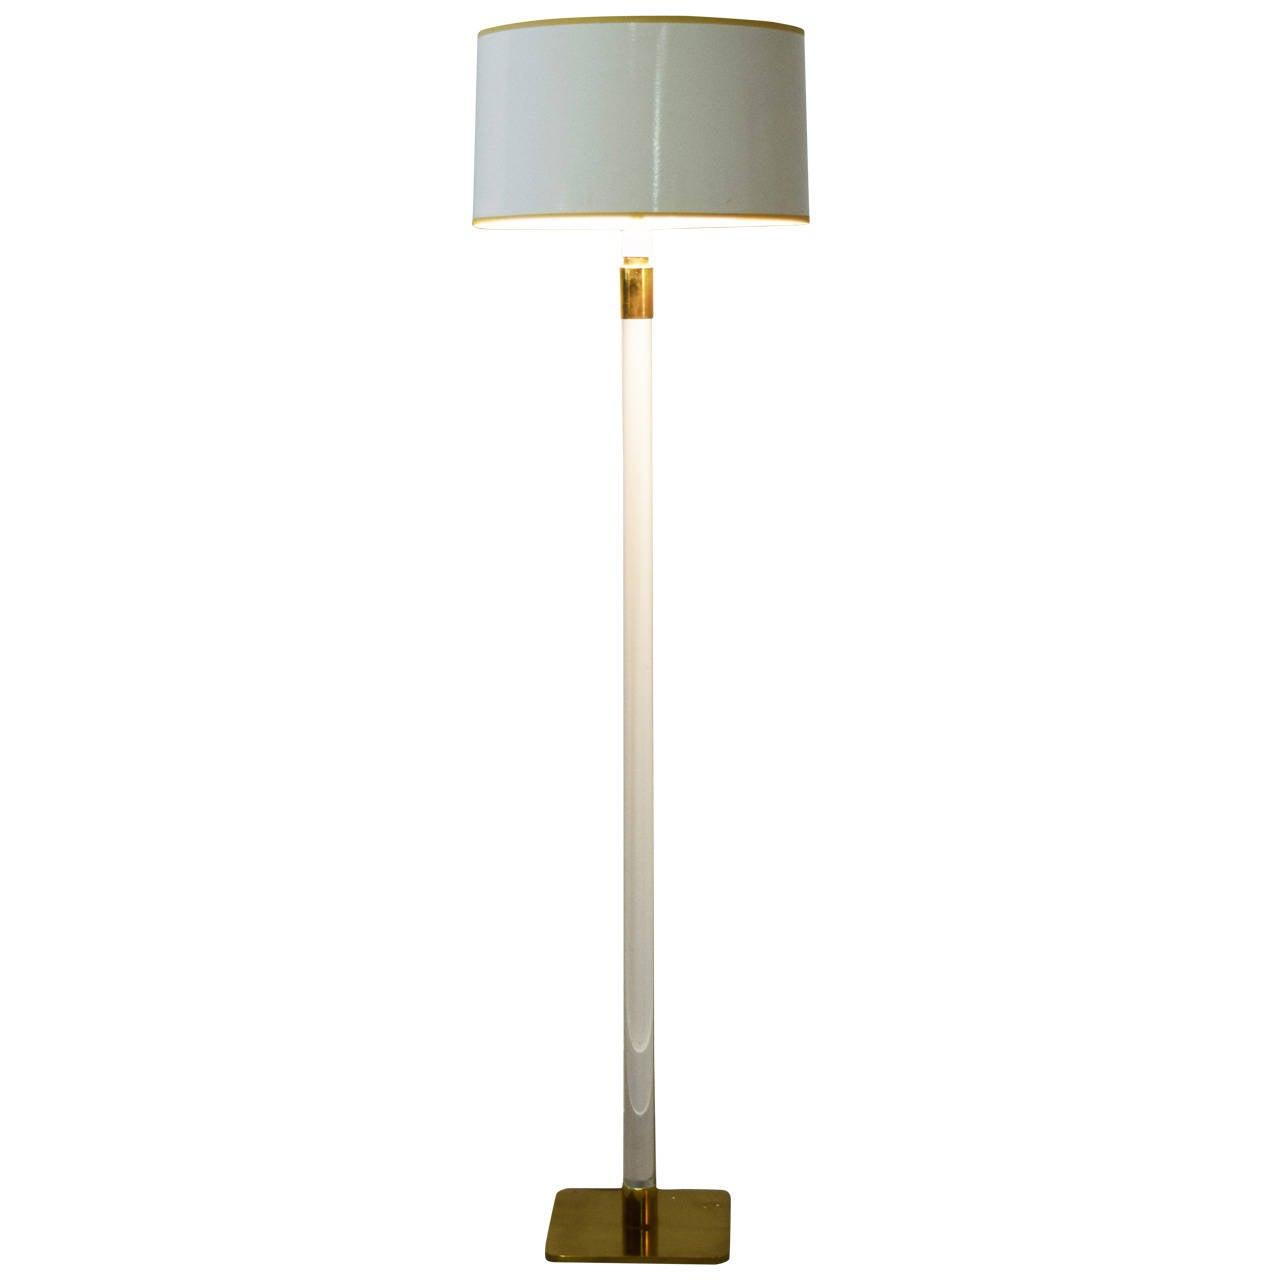 Glass and Brass Floor Lamp by Hansen